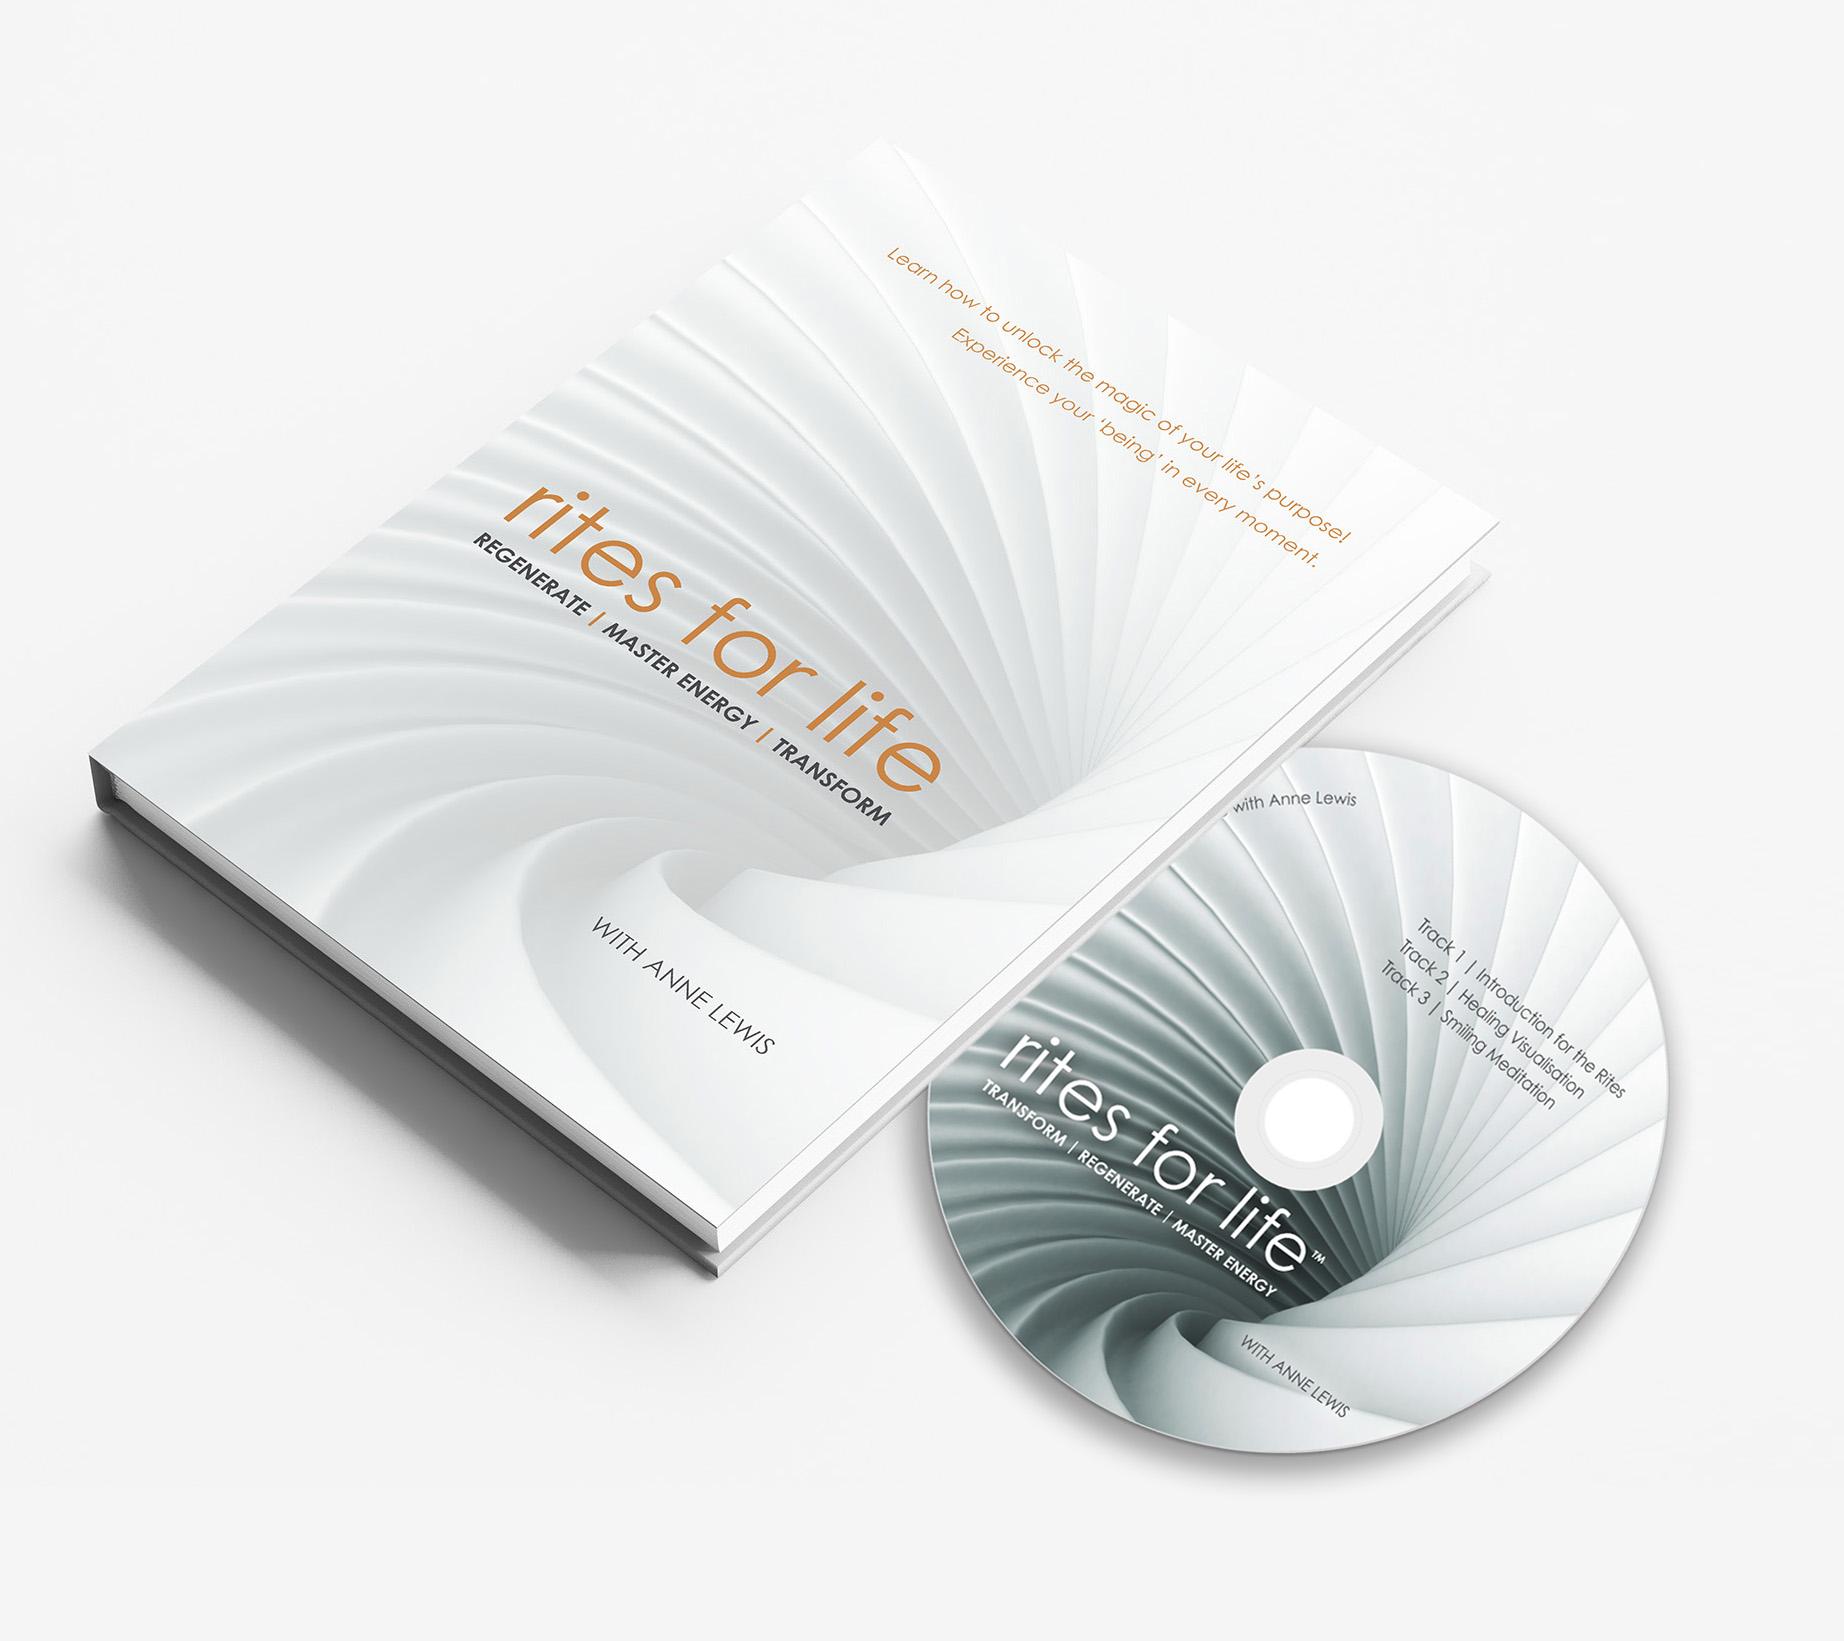 rites_for_life_book_cd.jpg